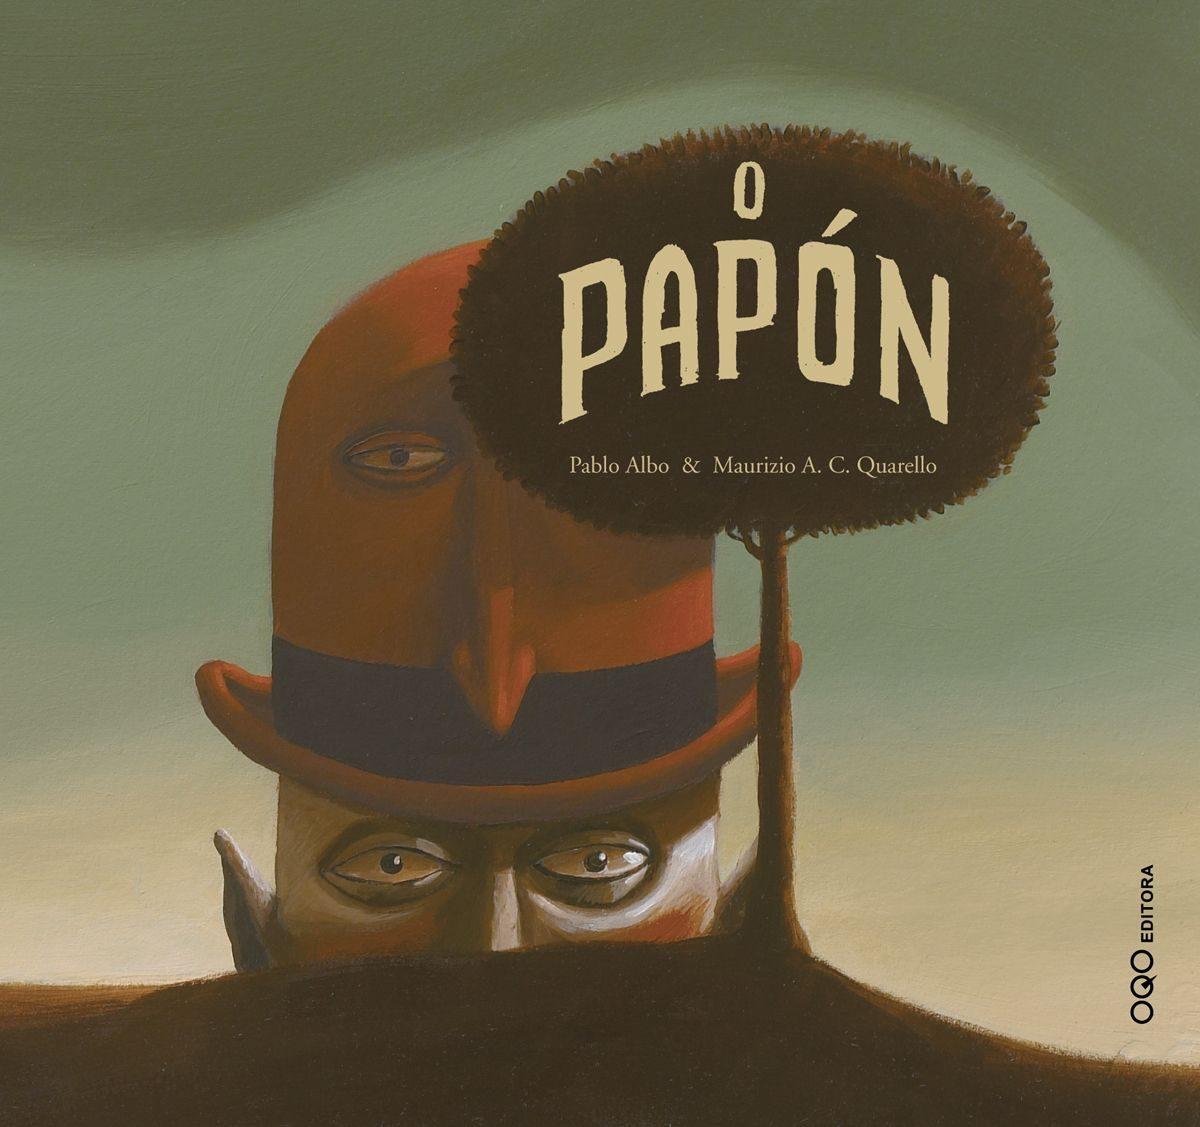 O Papon por Pablo Albo